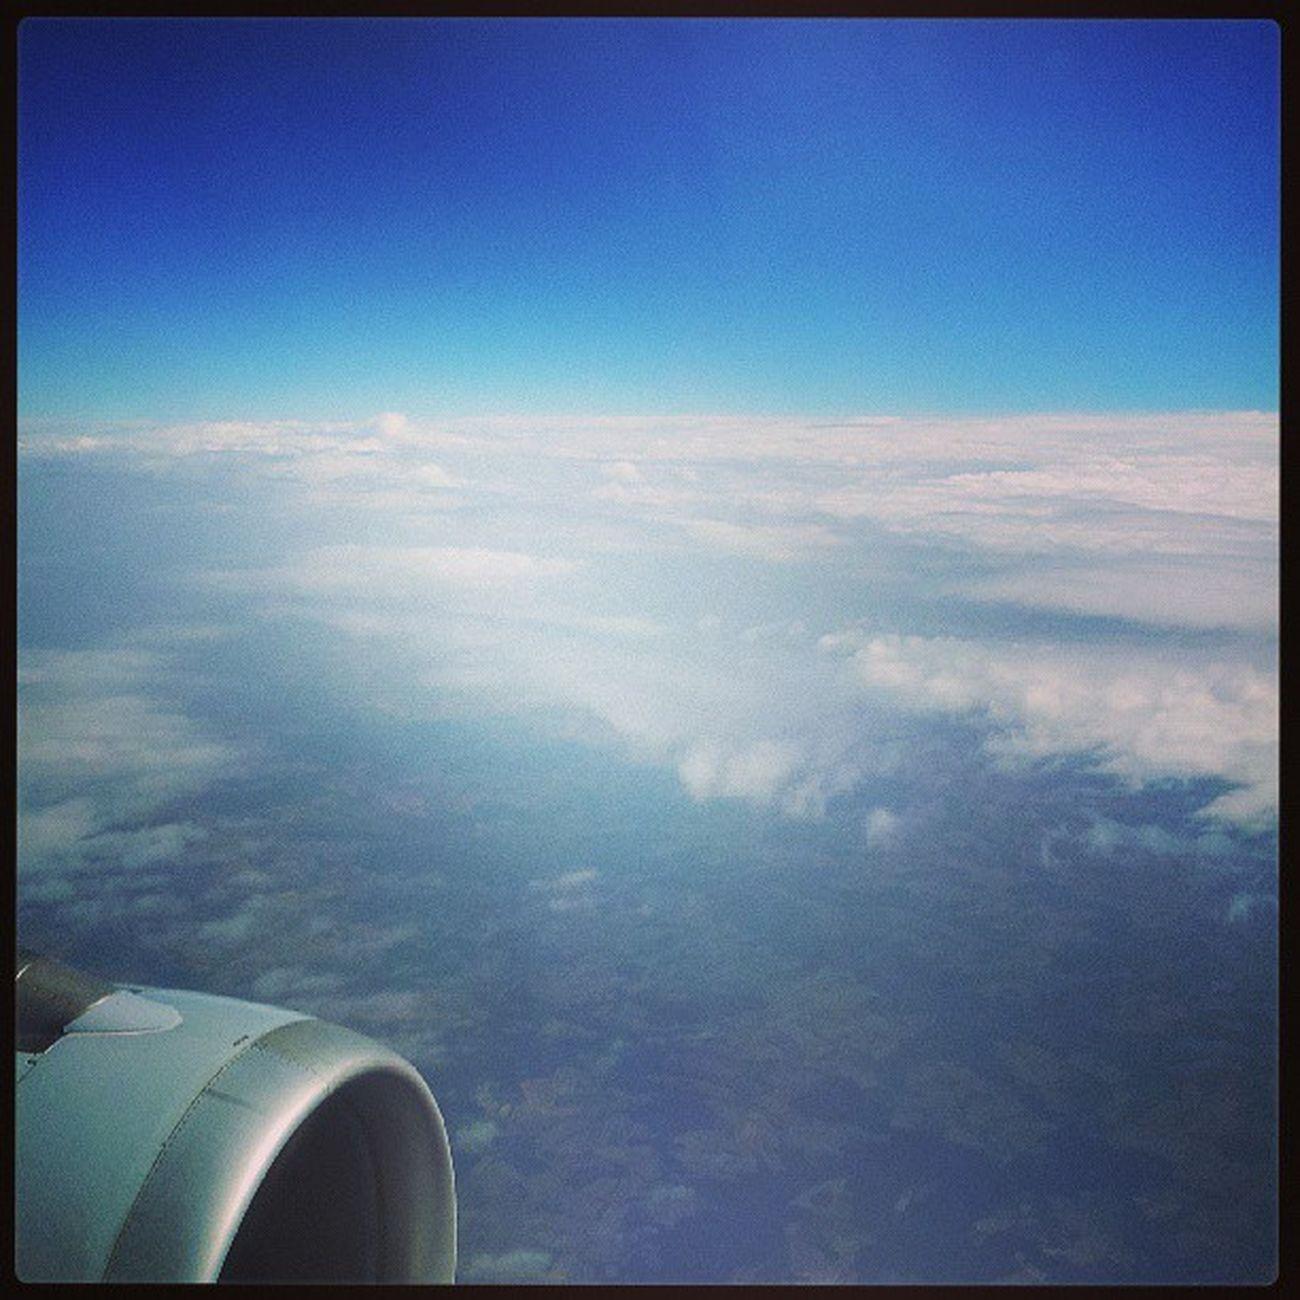 Sofia Bulgarie Avion Vacances